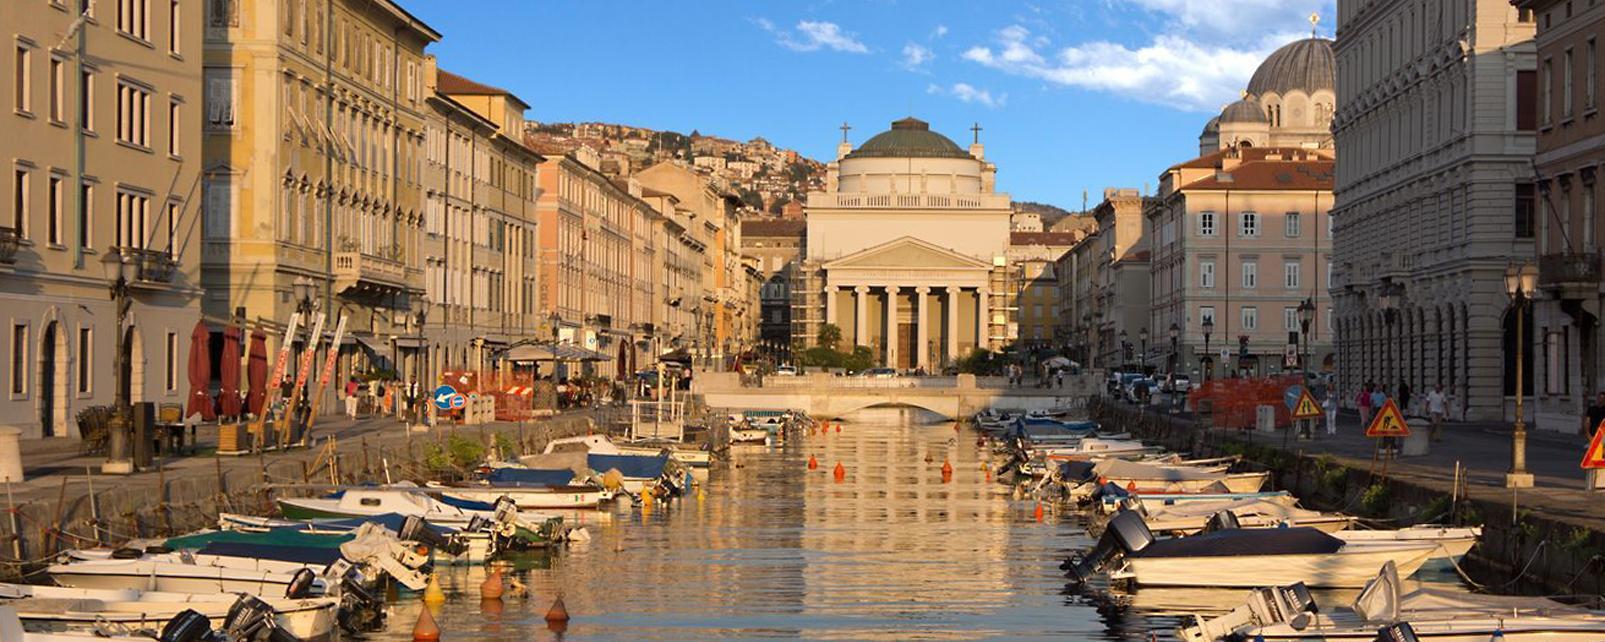 Europe; Italie; Frioul-Vénétie julienne; Trieste;